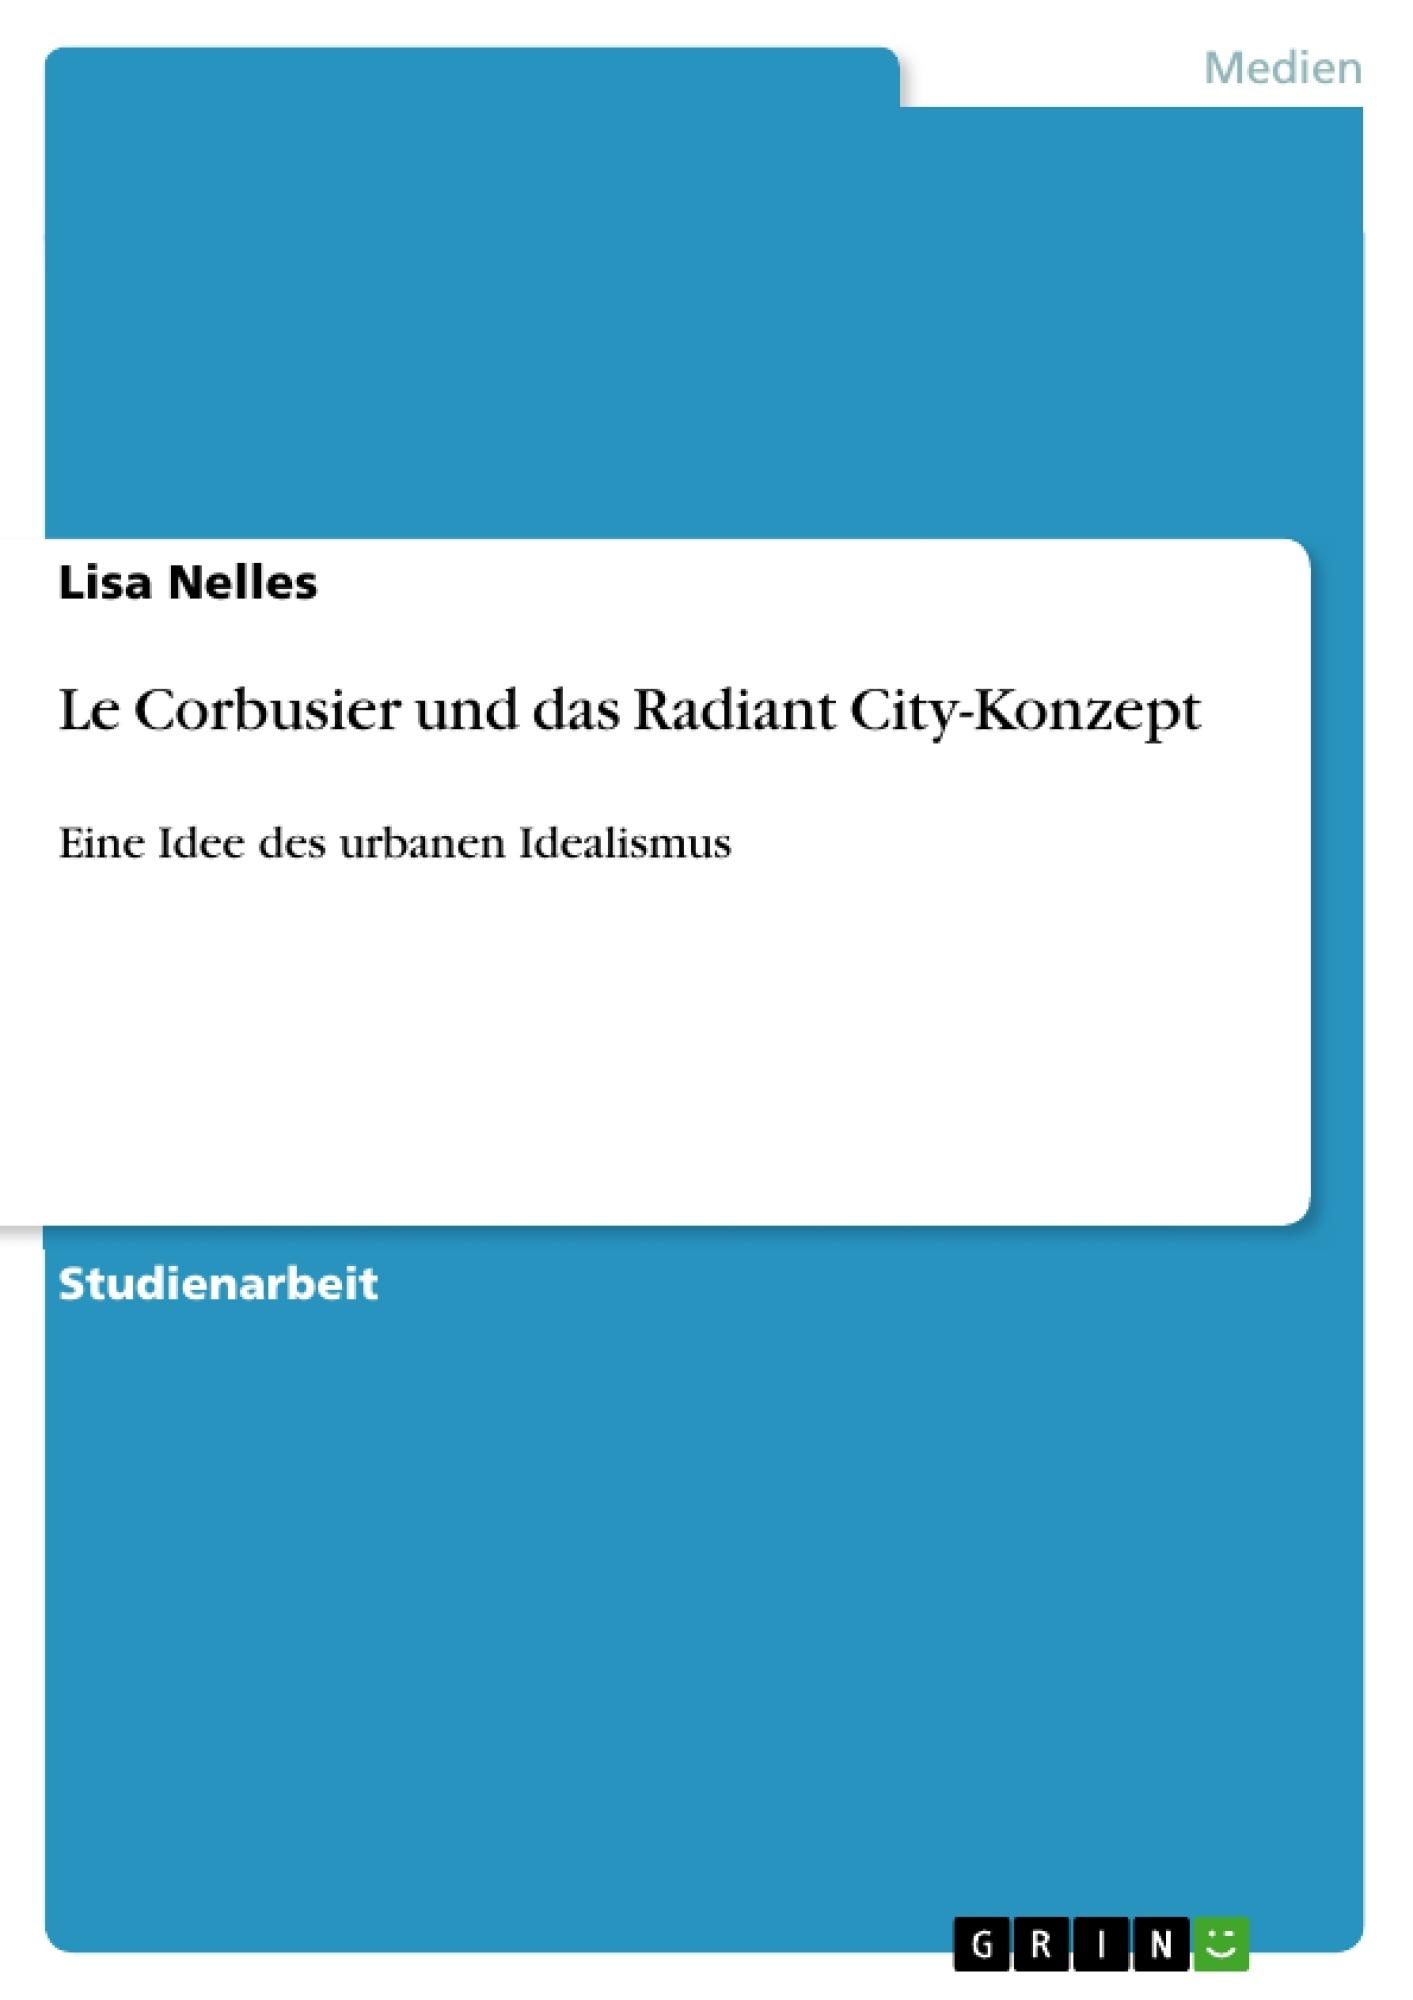 Titel: Le Corbusier und das Radiant City-Konzept